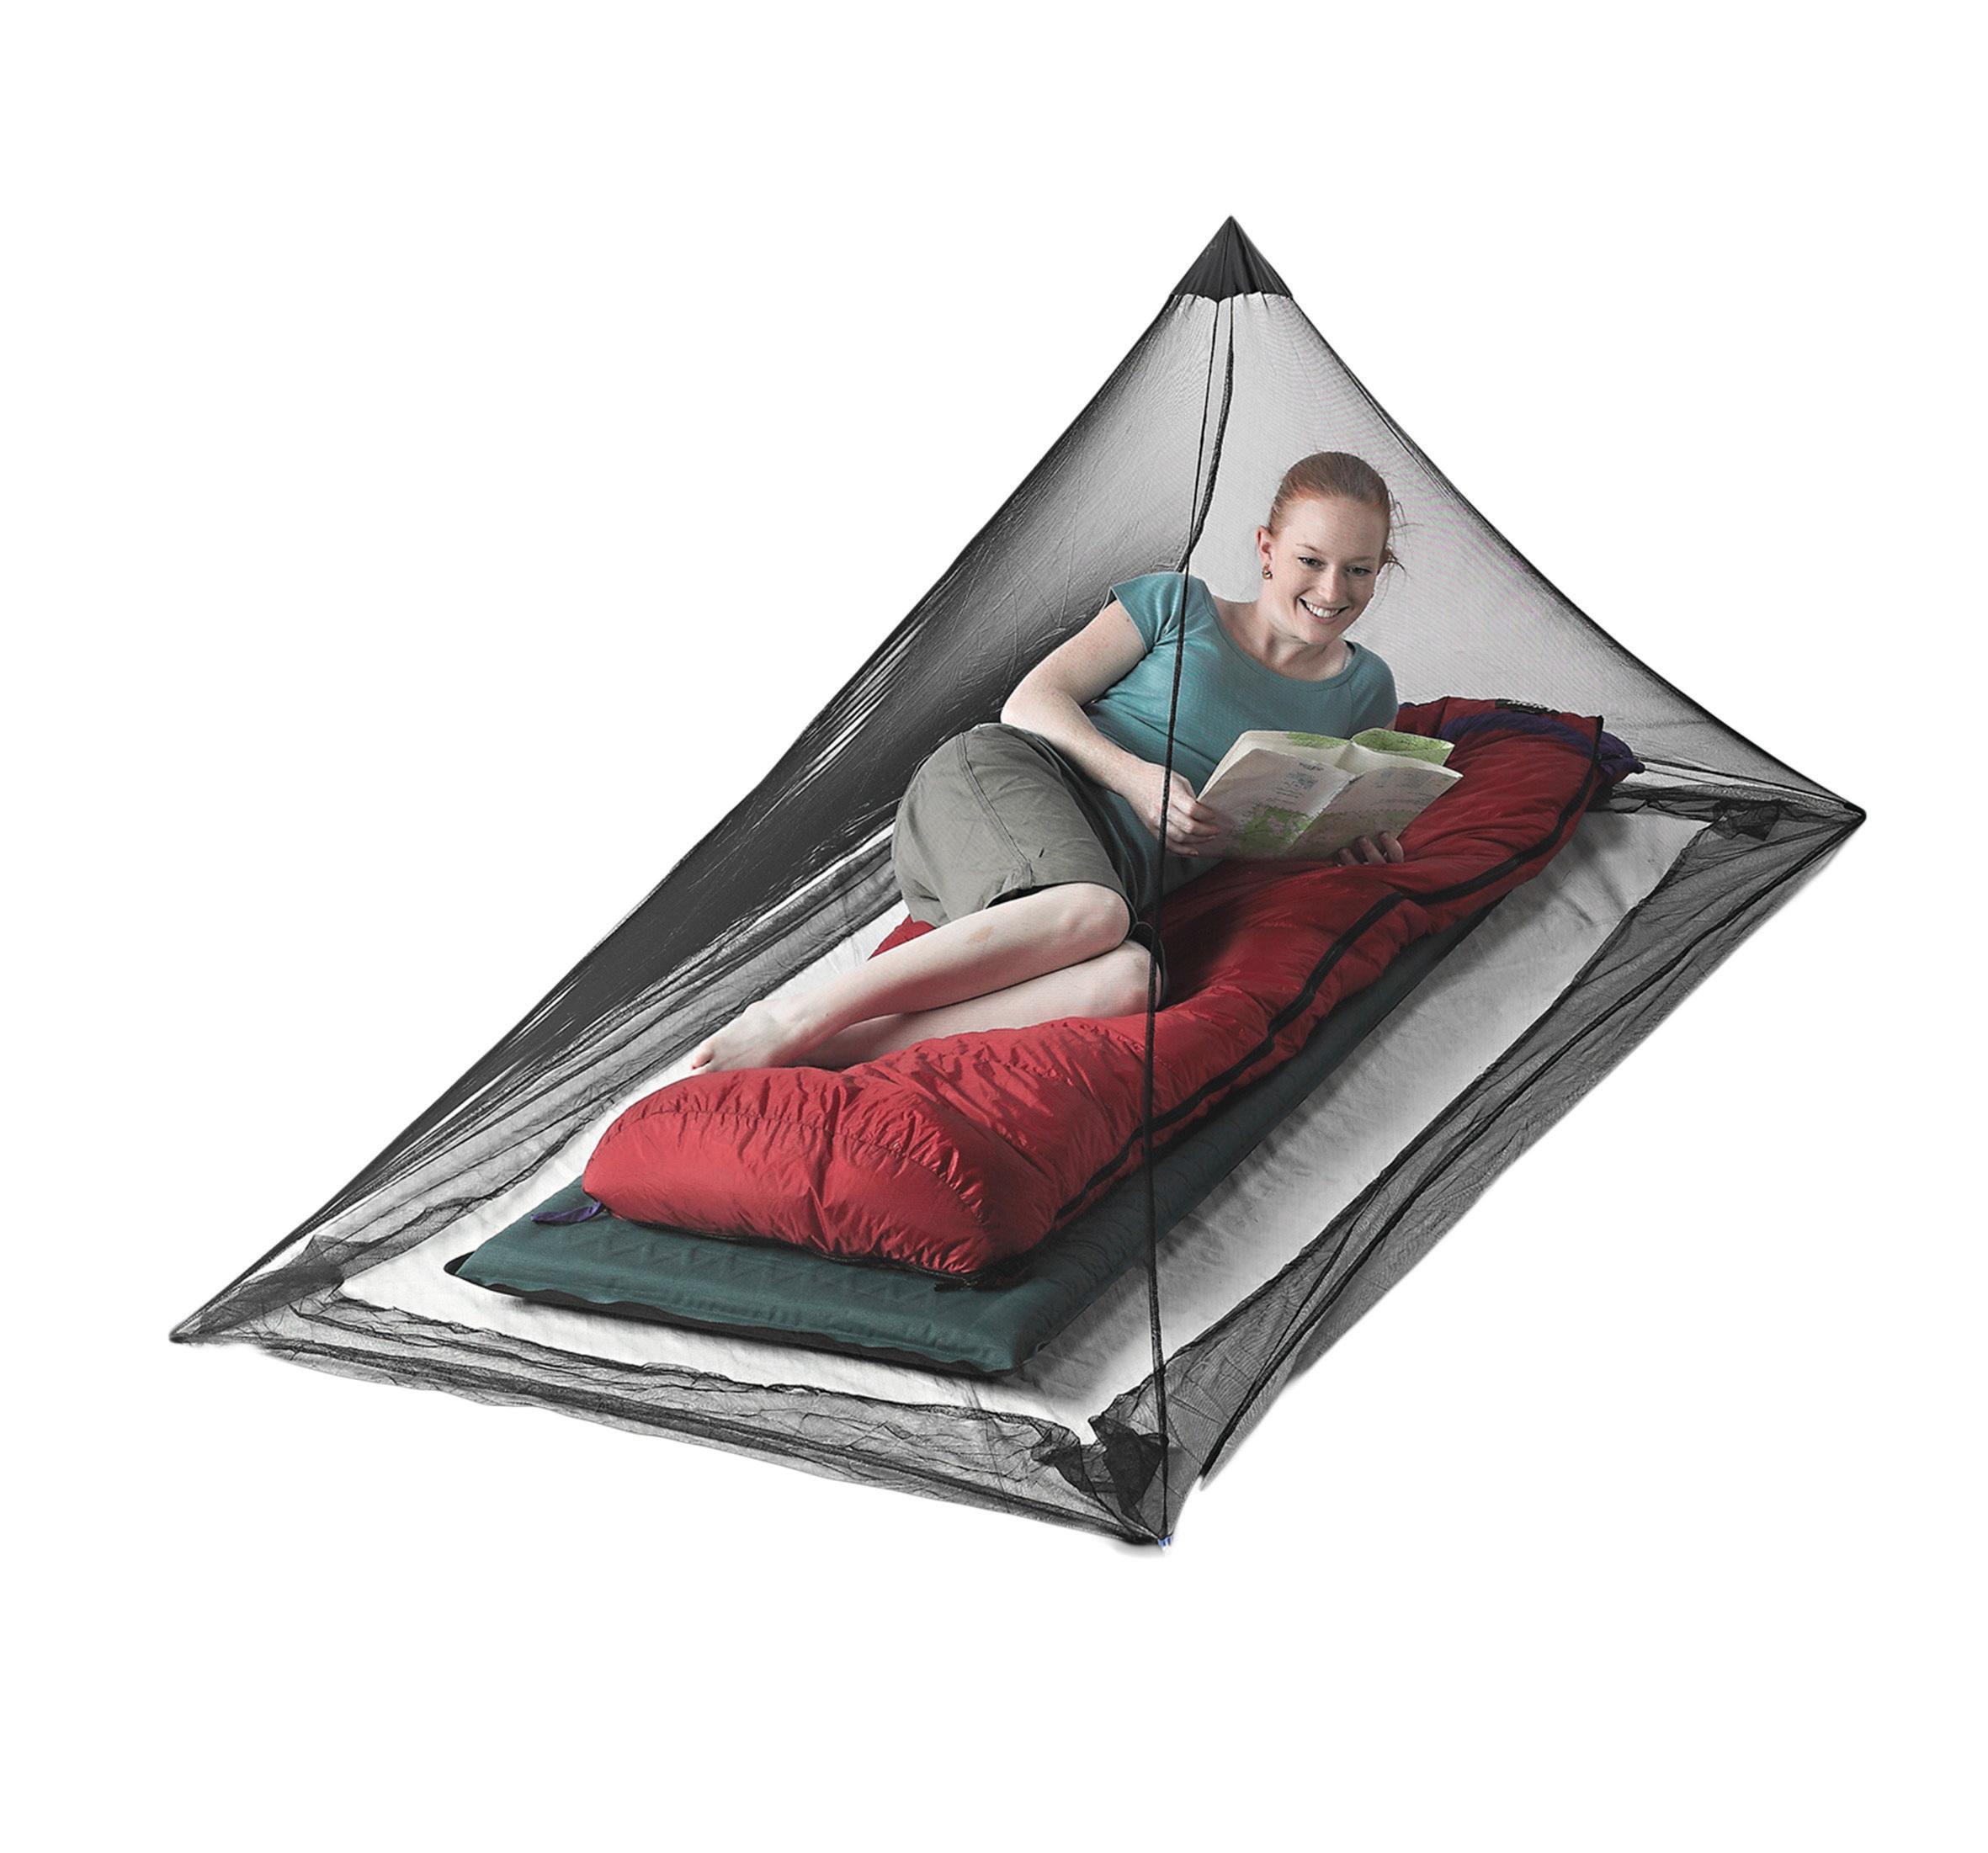 Billede af Seatosummit Nano Mosquito Pyramid Net Single